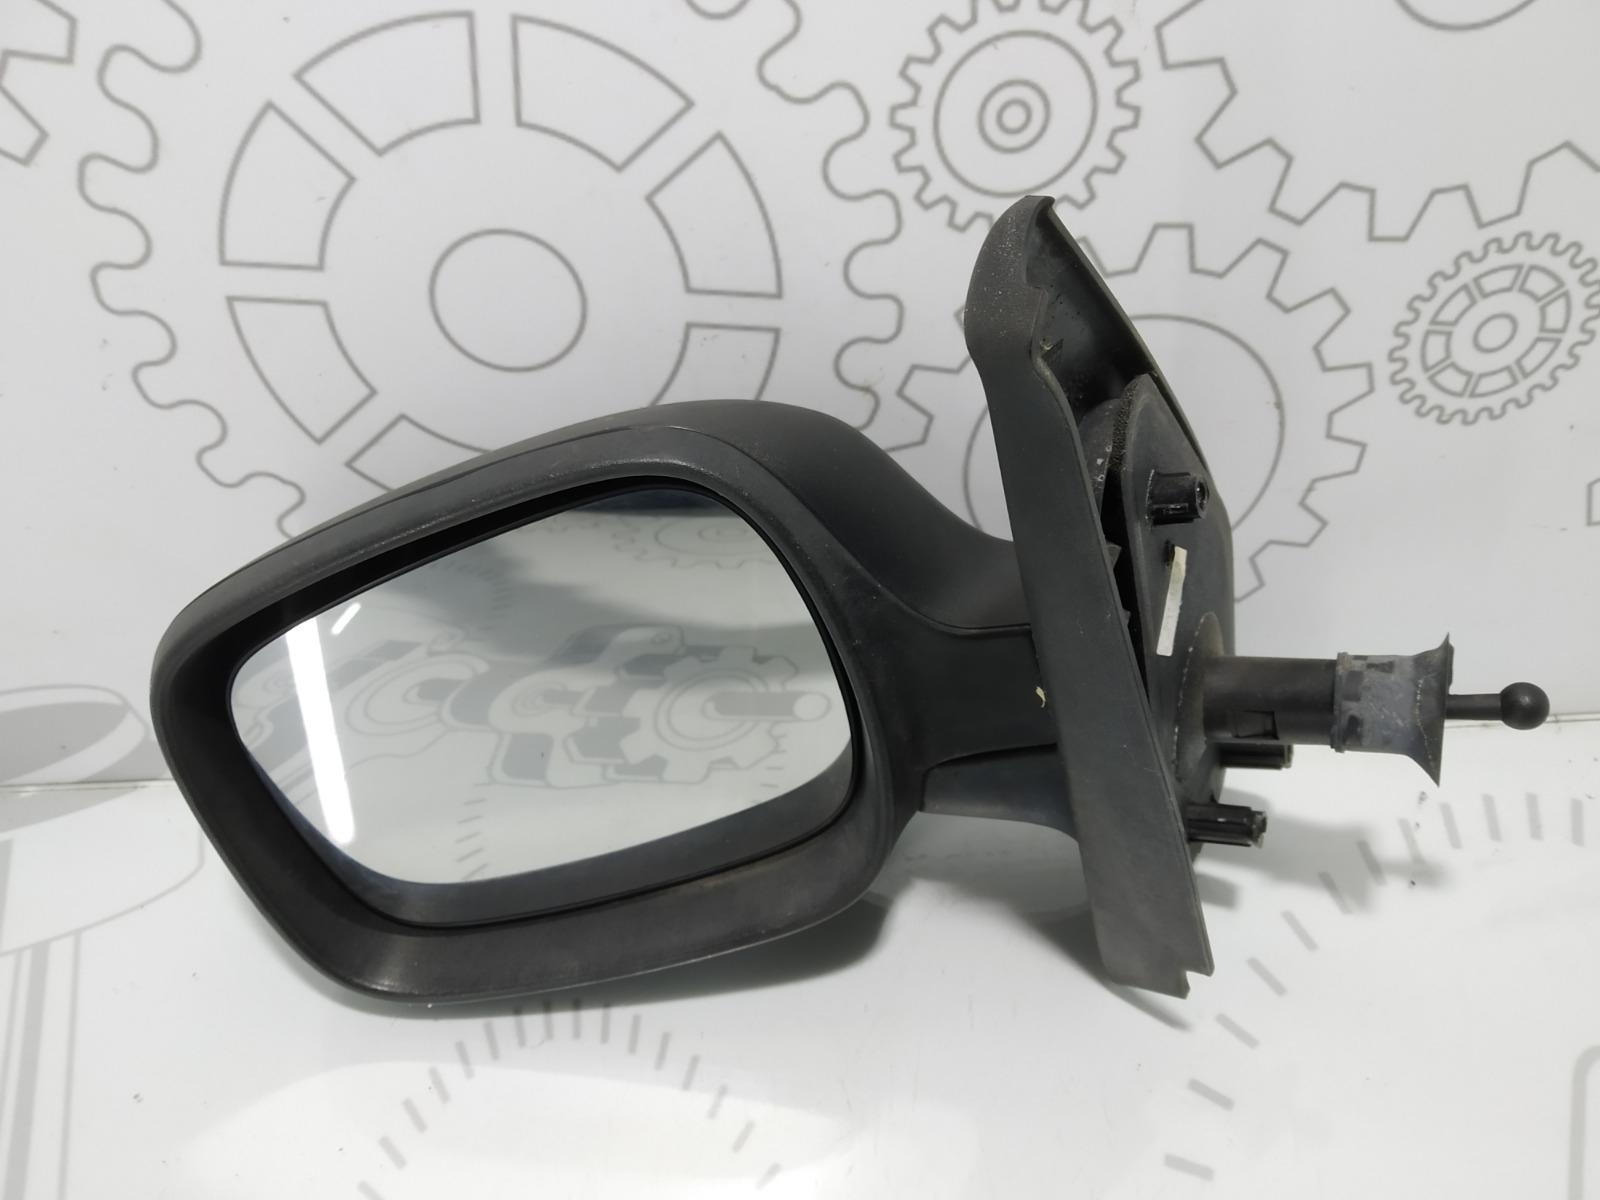 Зеркало наружное левое Renault Kangoo 1.2 I 2007 (б/у)